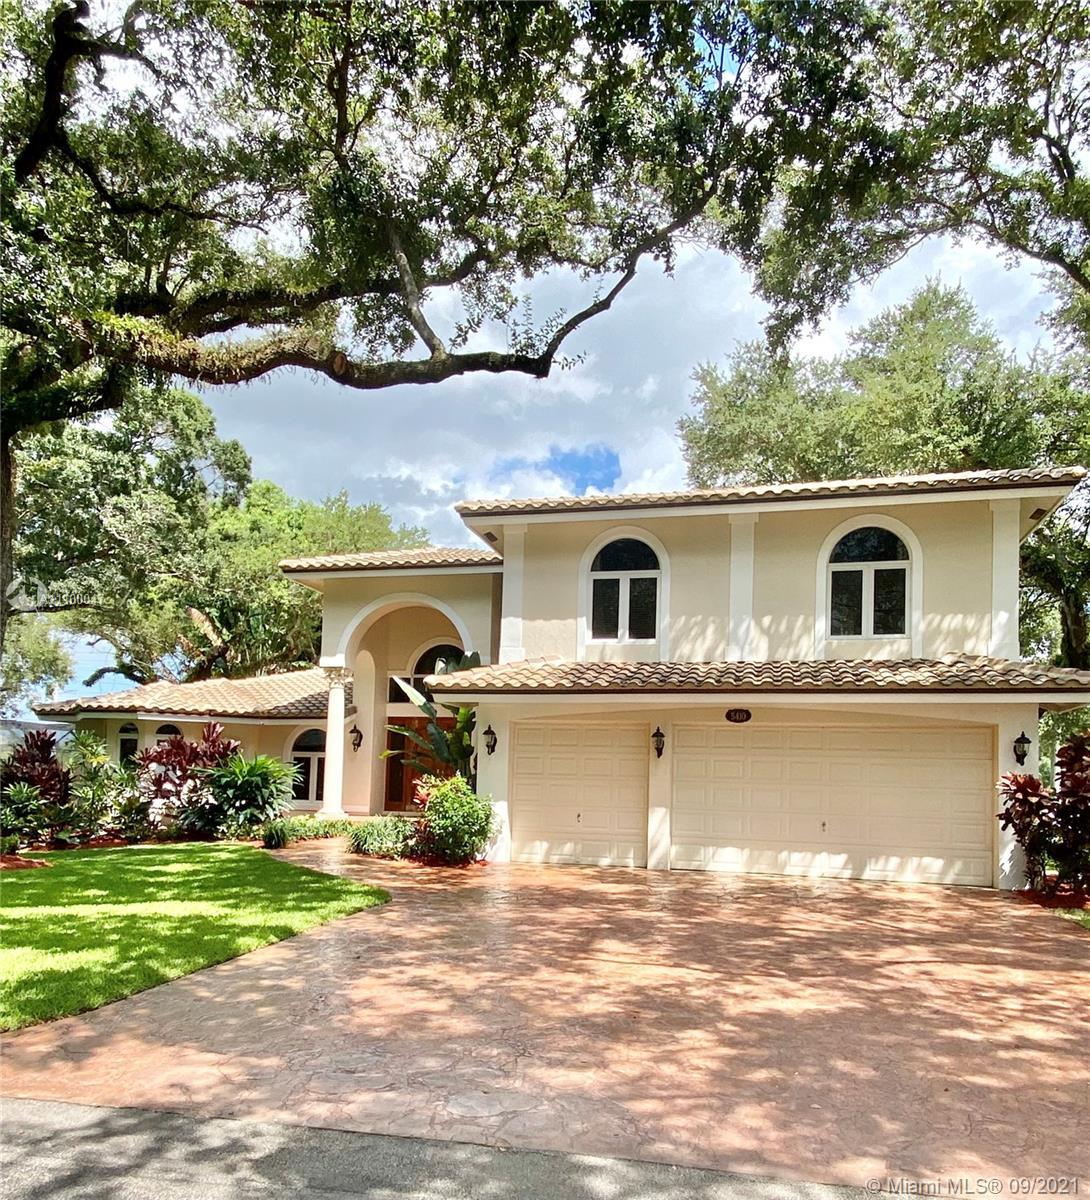 5410 Shady Oak Ln, Dania Beach, Florida 33312